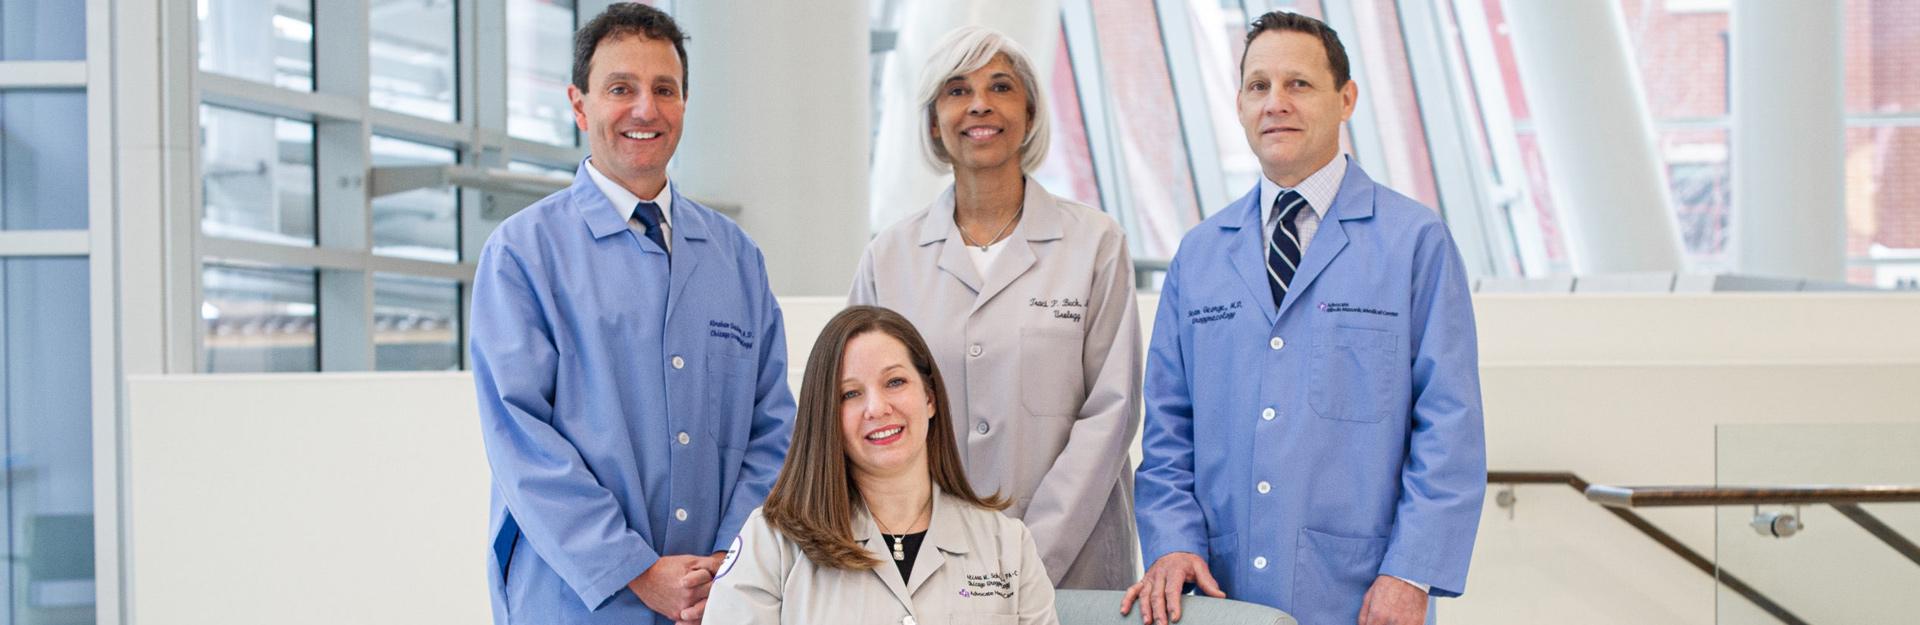 Fibroid Treatment Collaborative staff